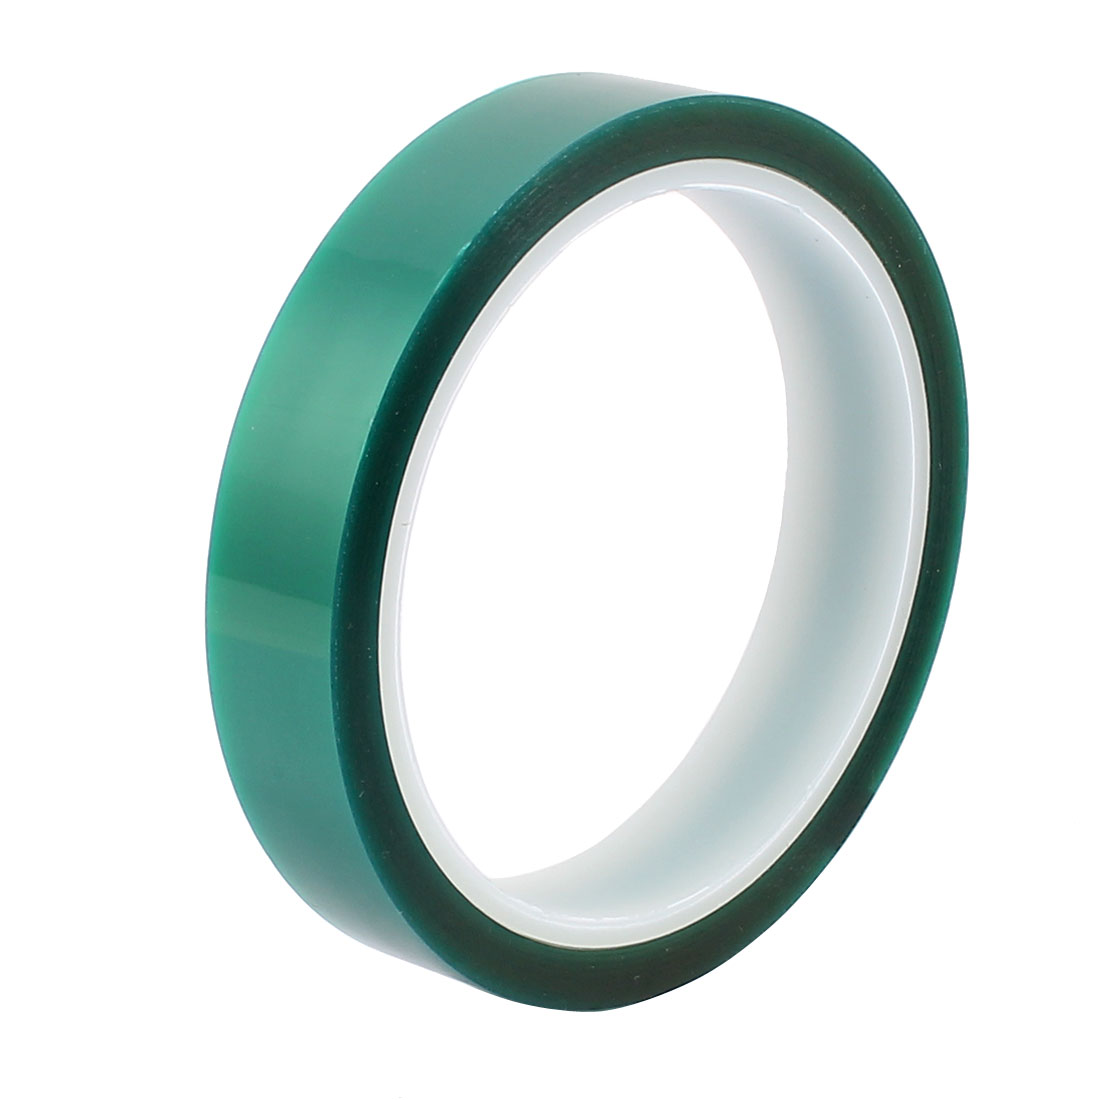 20mm Width 33 Meters Long Green PET High Temperature Heat Resistant PCB Solder Tape